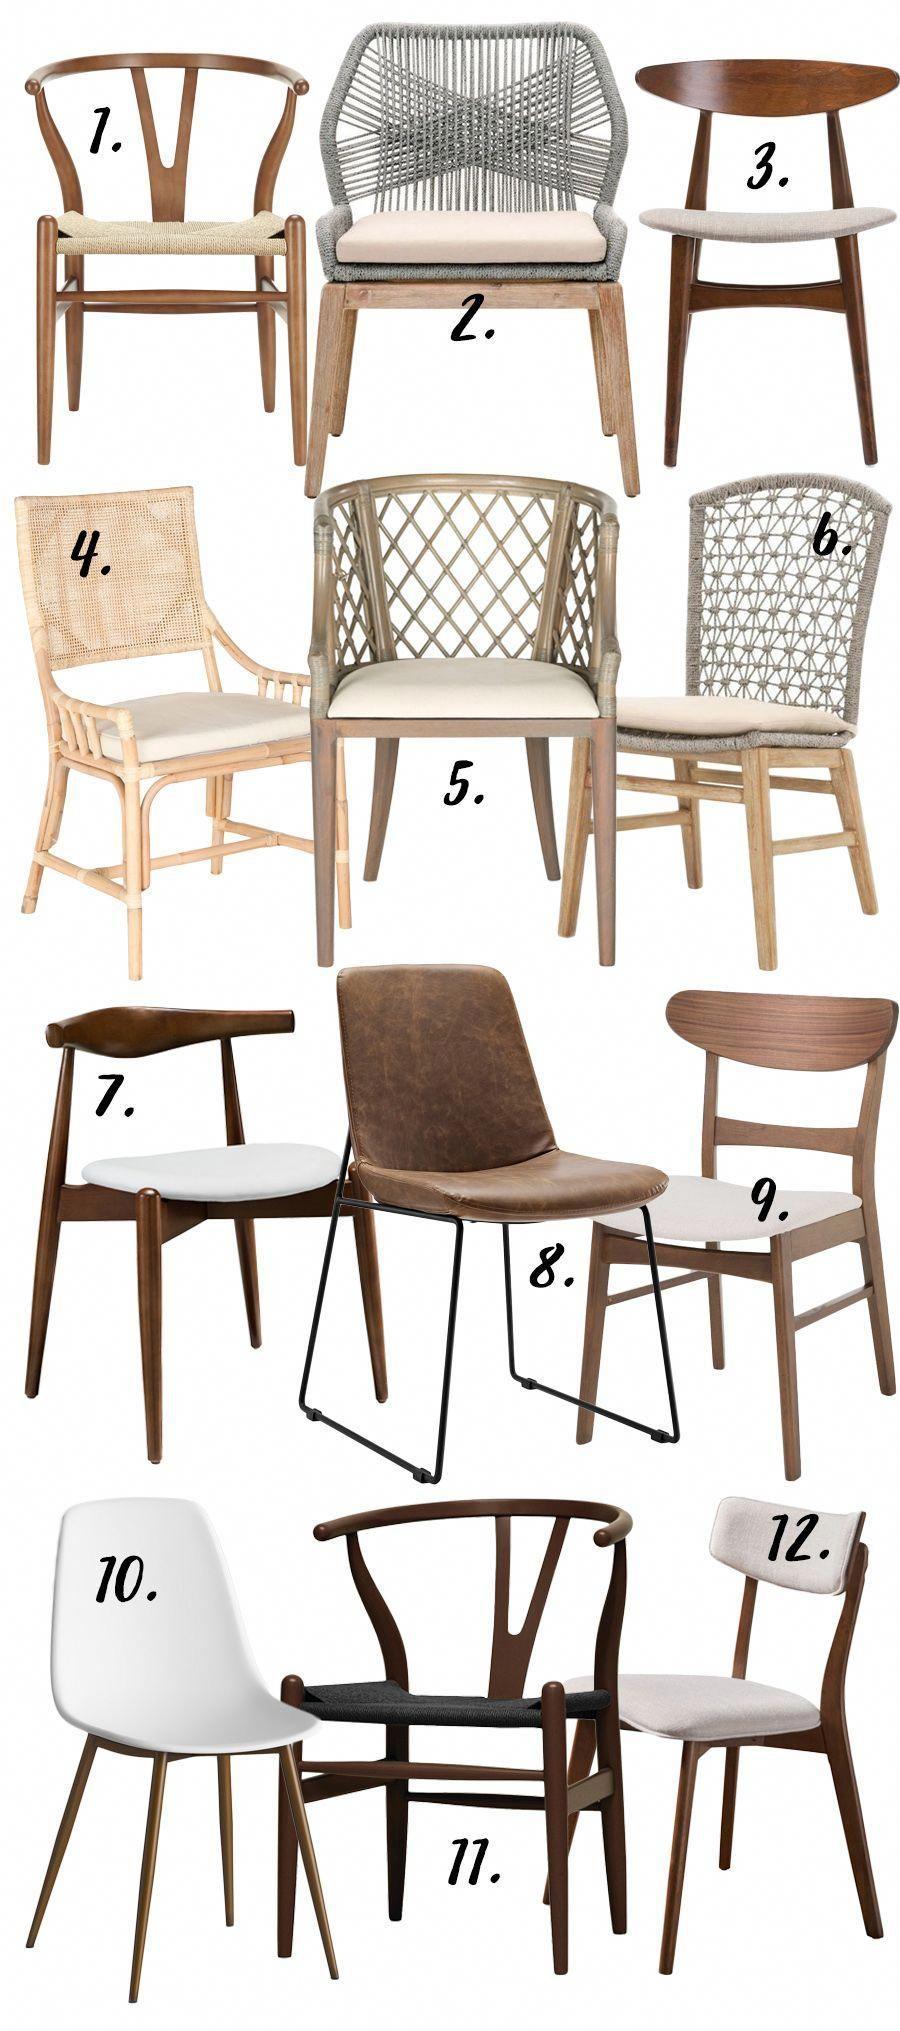 Modern Bohemian Dining Room Chairs To Suit Every Budget Hey Djangles Heydjang Bohem Bohemian Dining Room Decor Boho Dining Chairs Cheap Dining Room Table